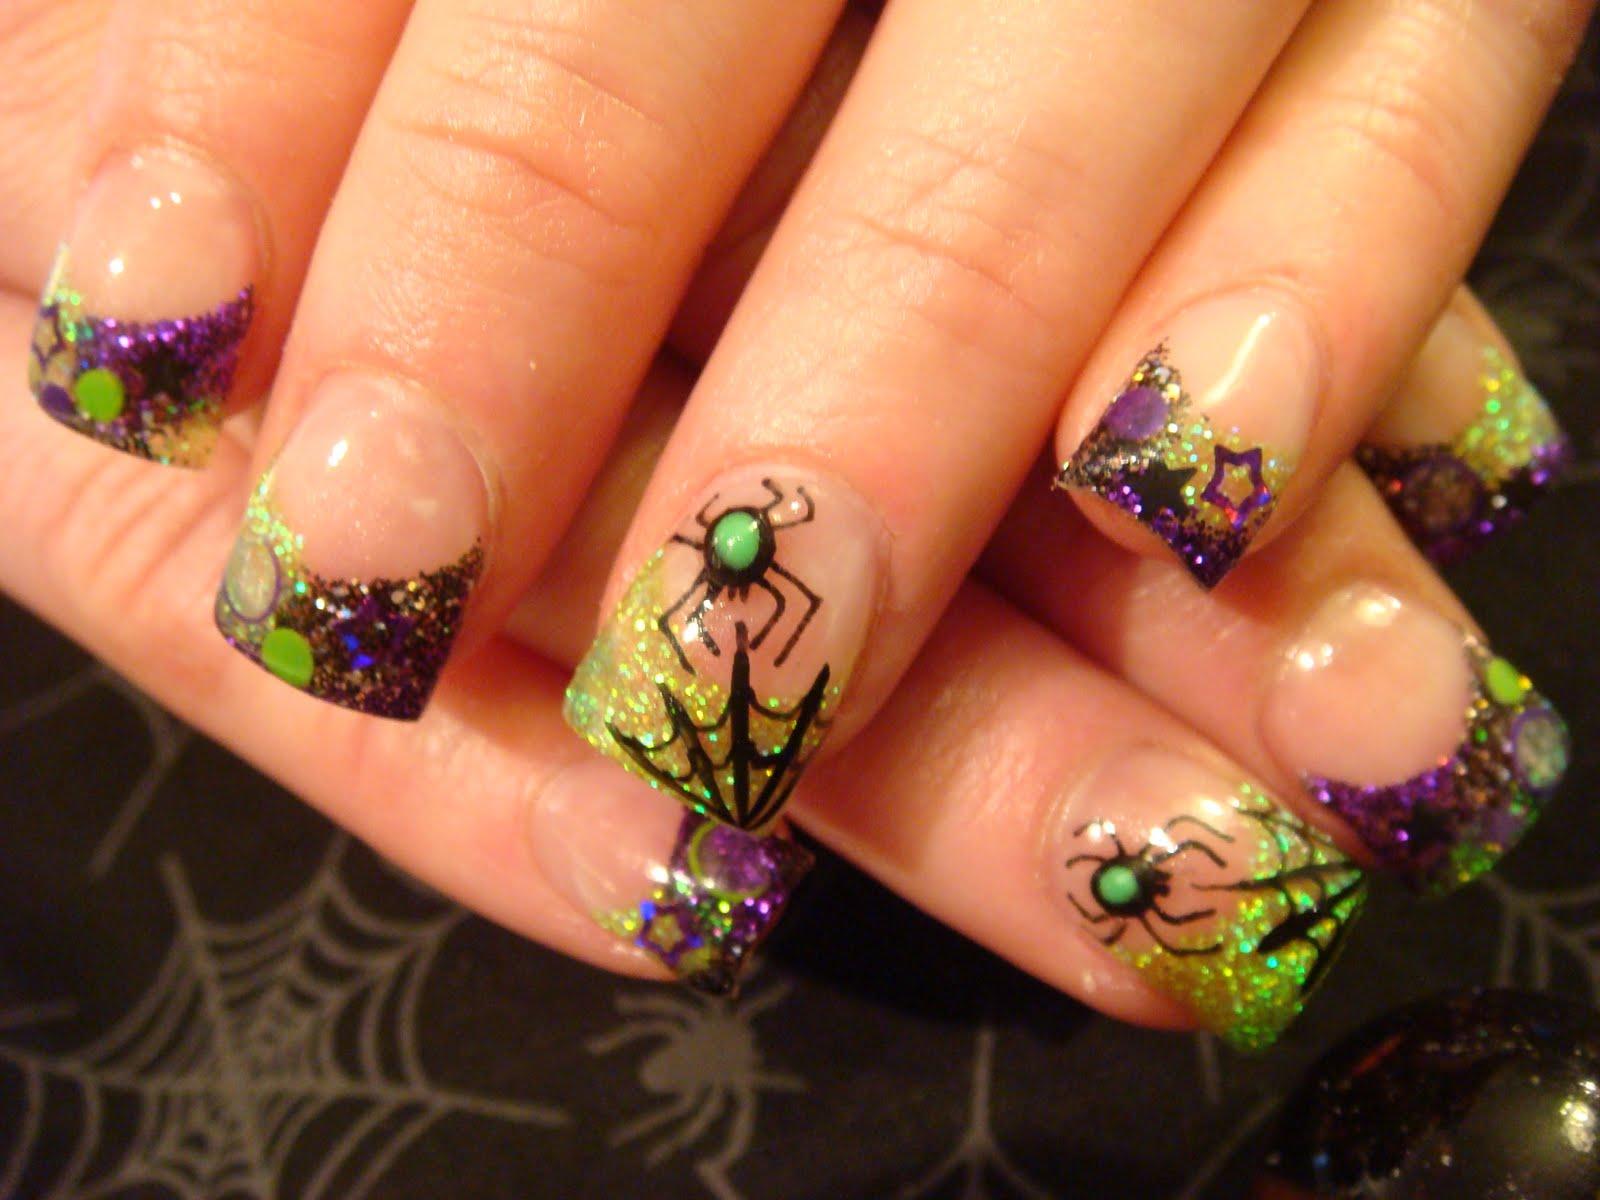 Nail art halloween ooh lala - Nail art halloween ...